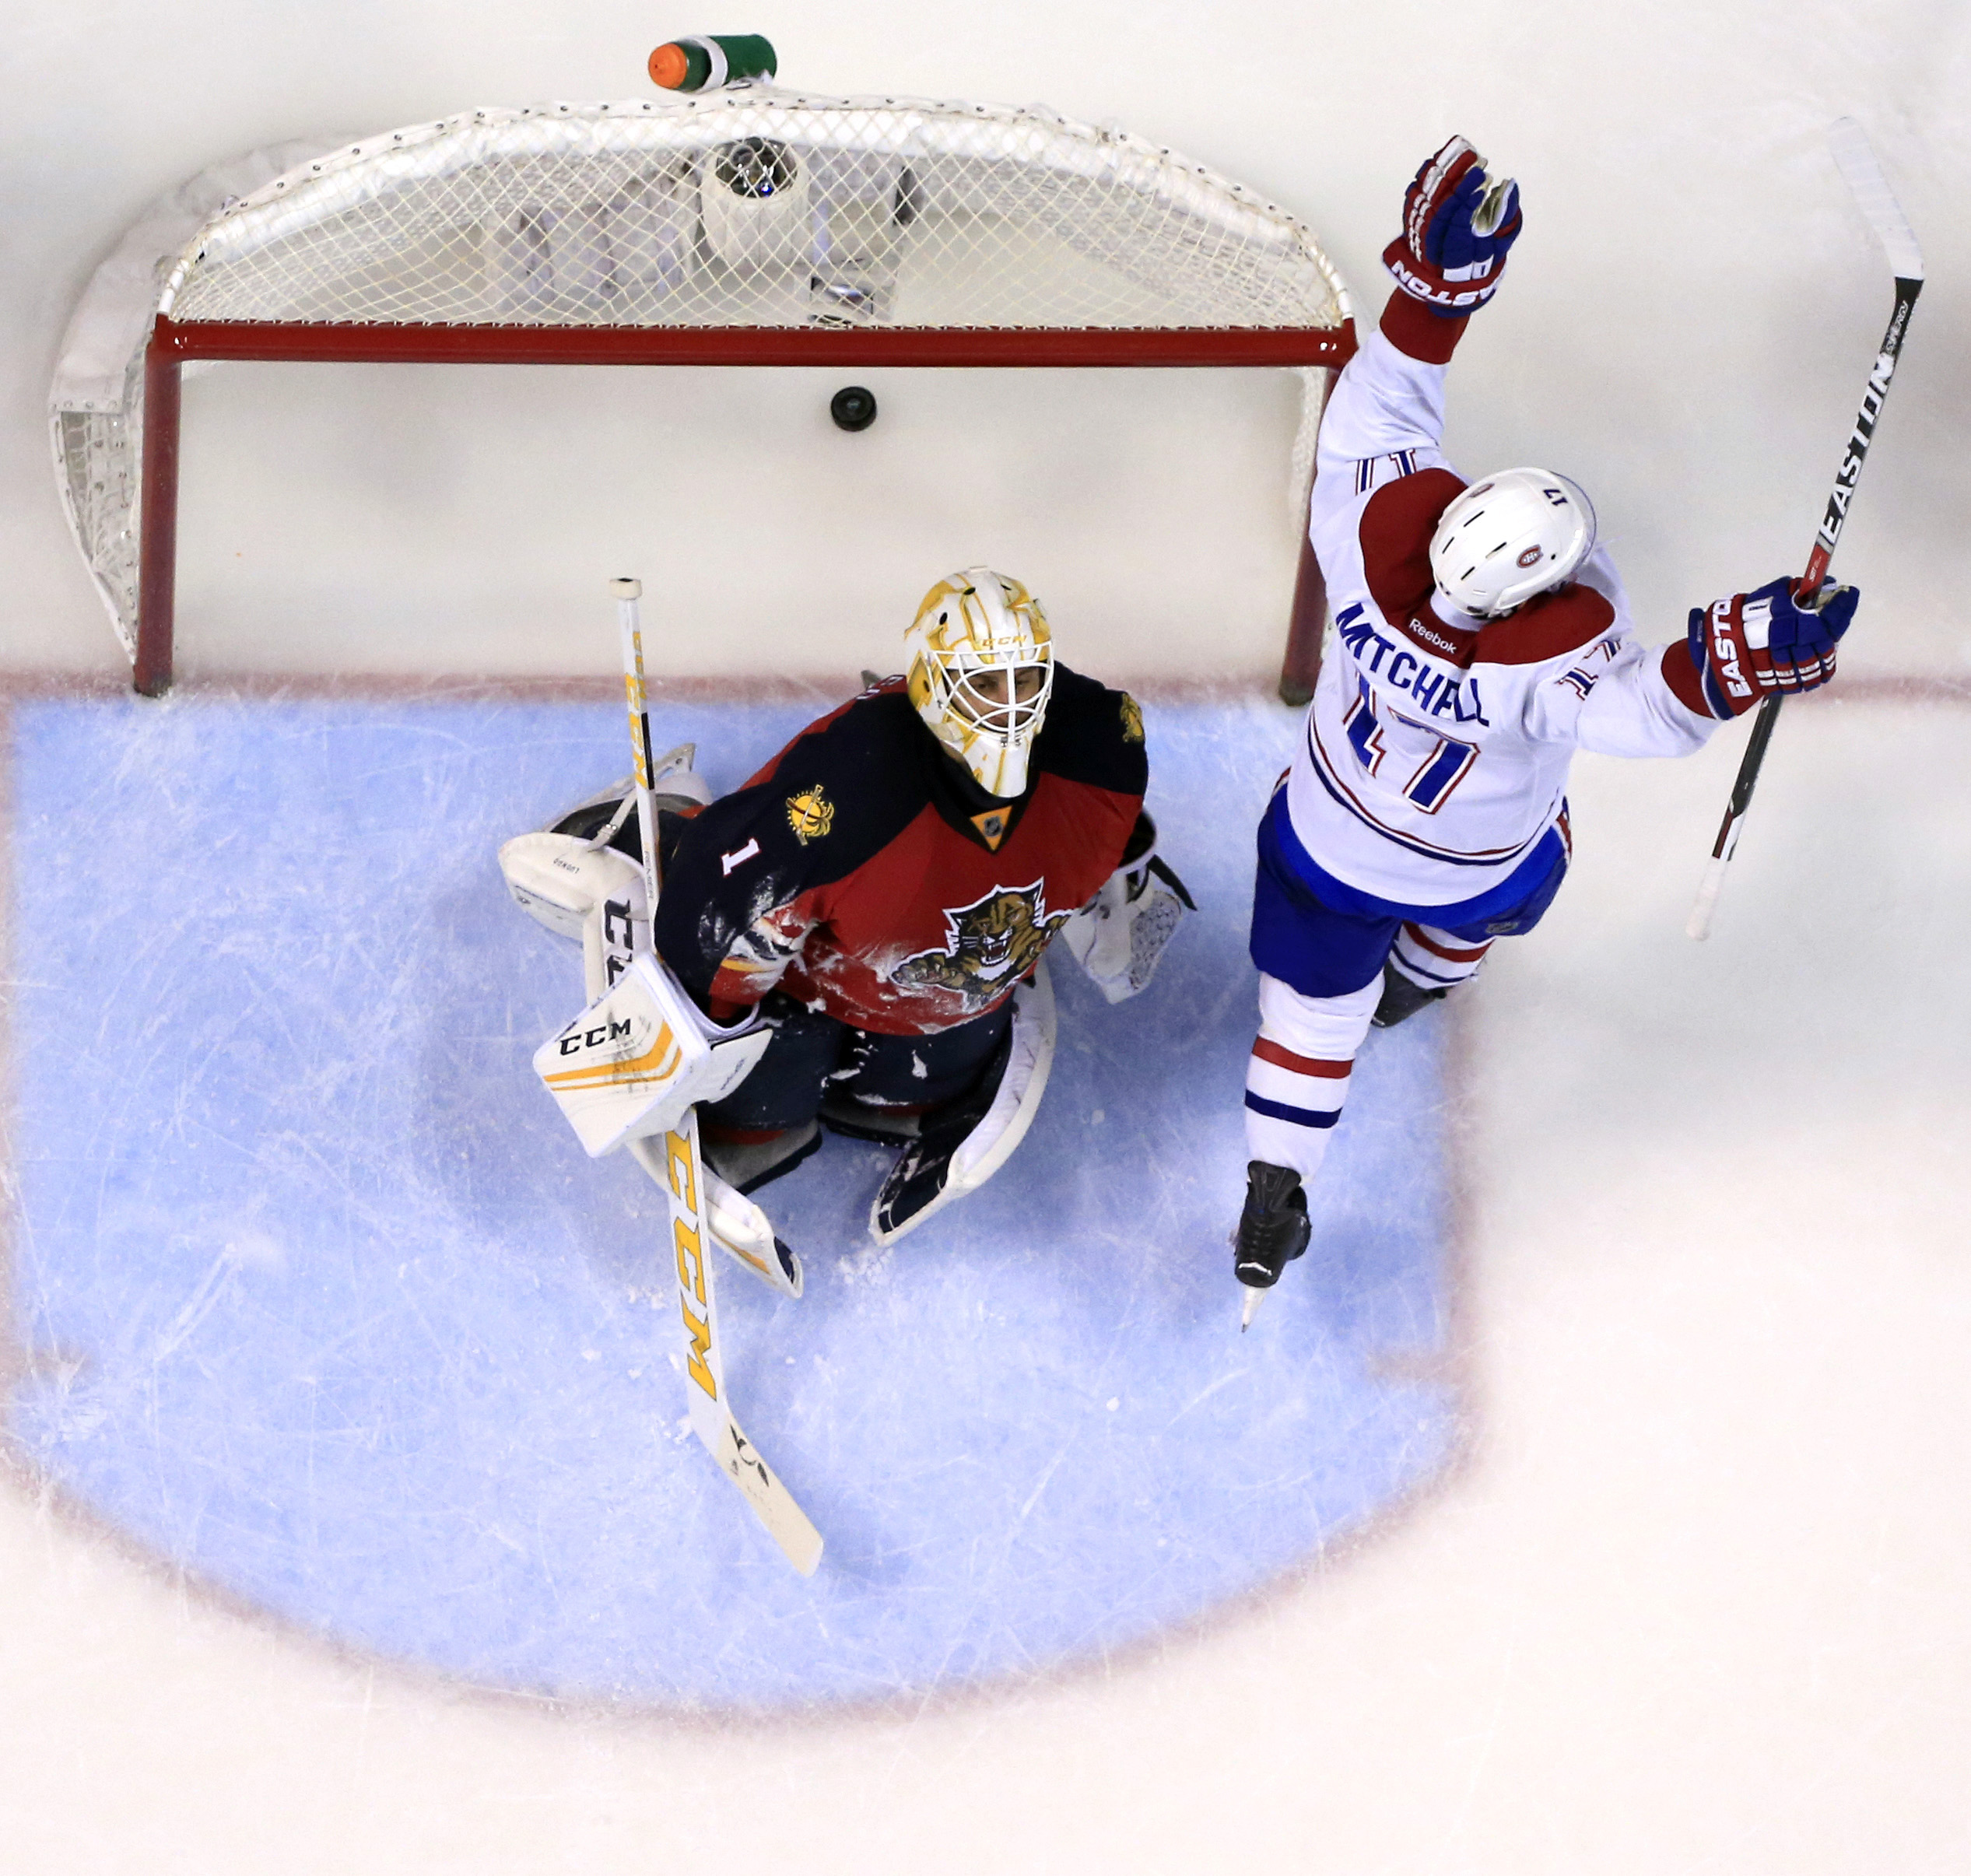 NHL: Montreal Canadiens at Florida Panthers